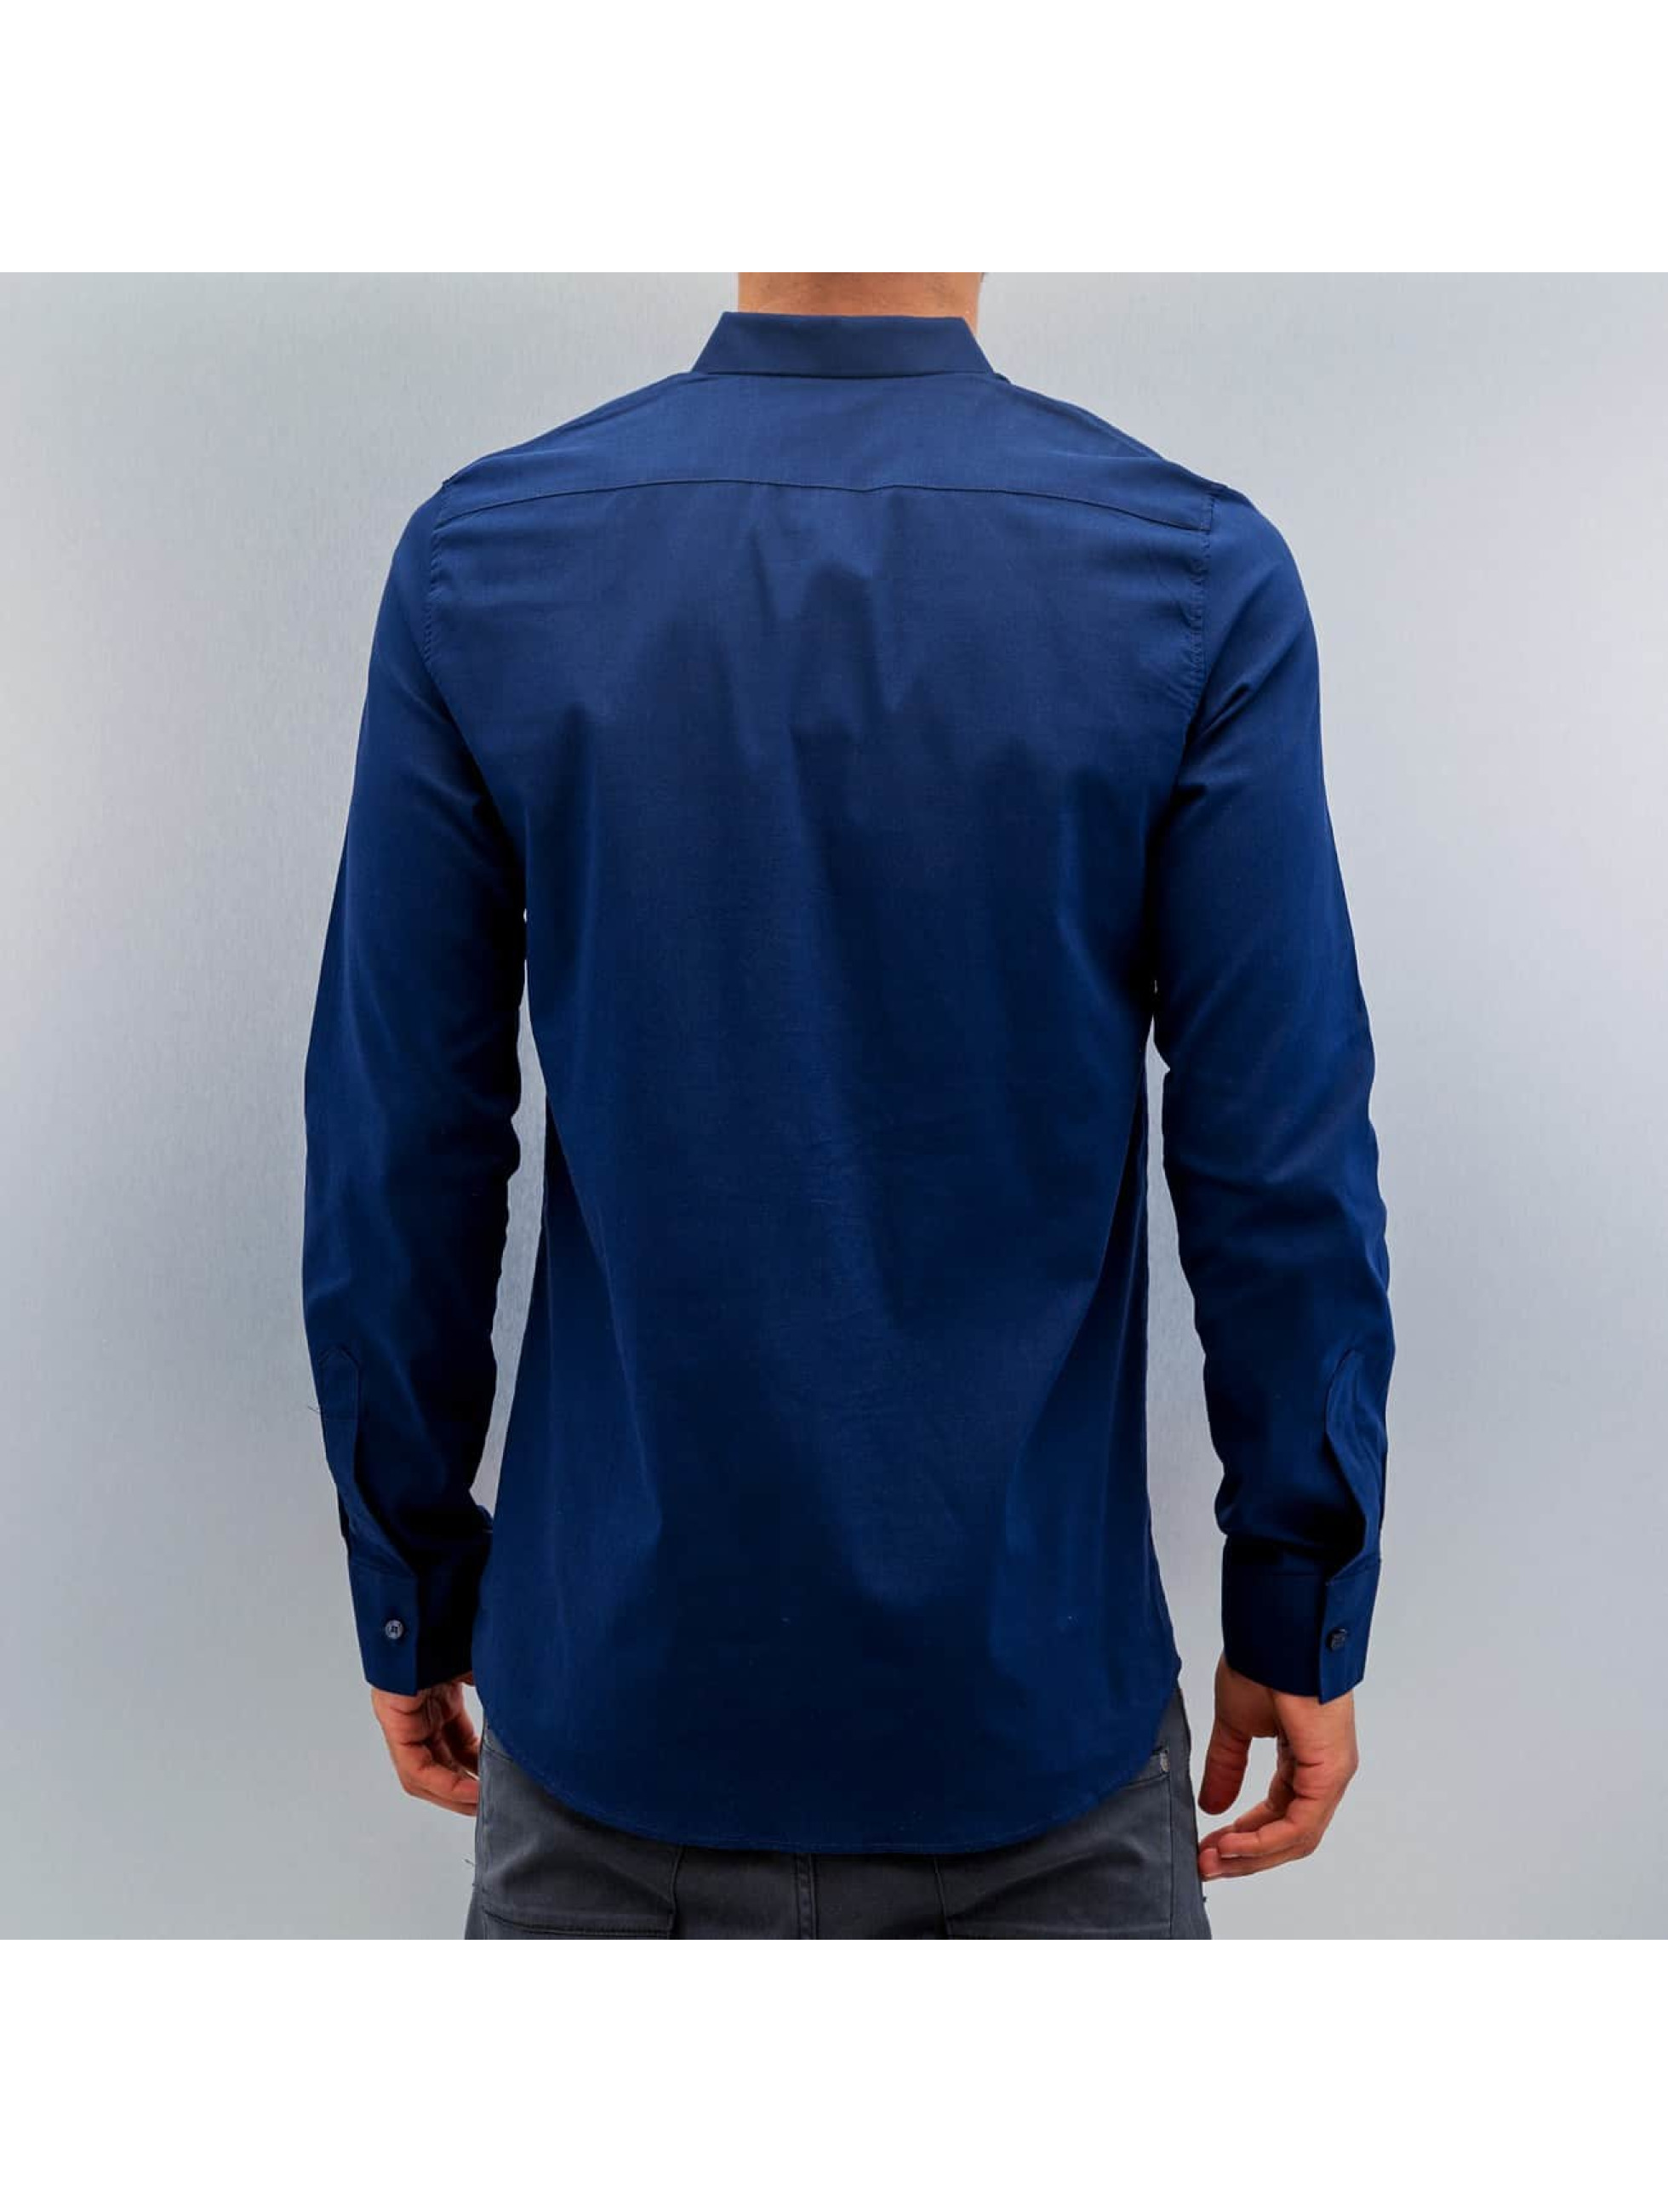 Open overhemd Ante blauw